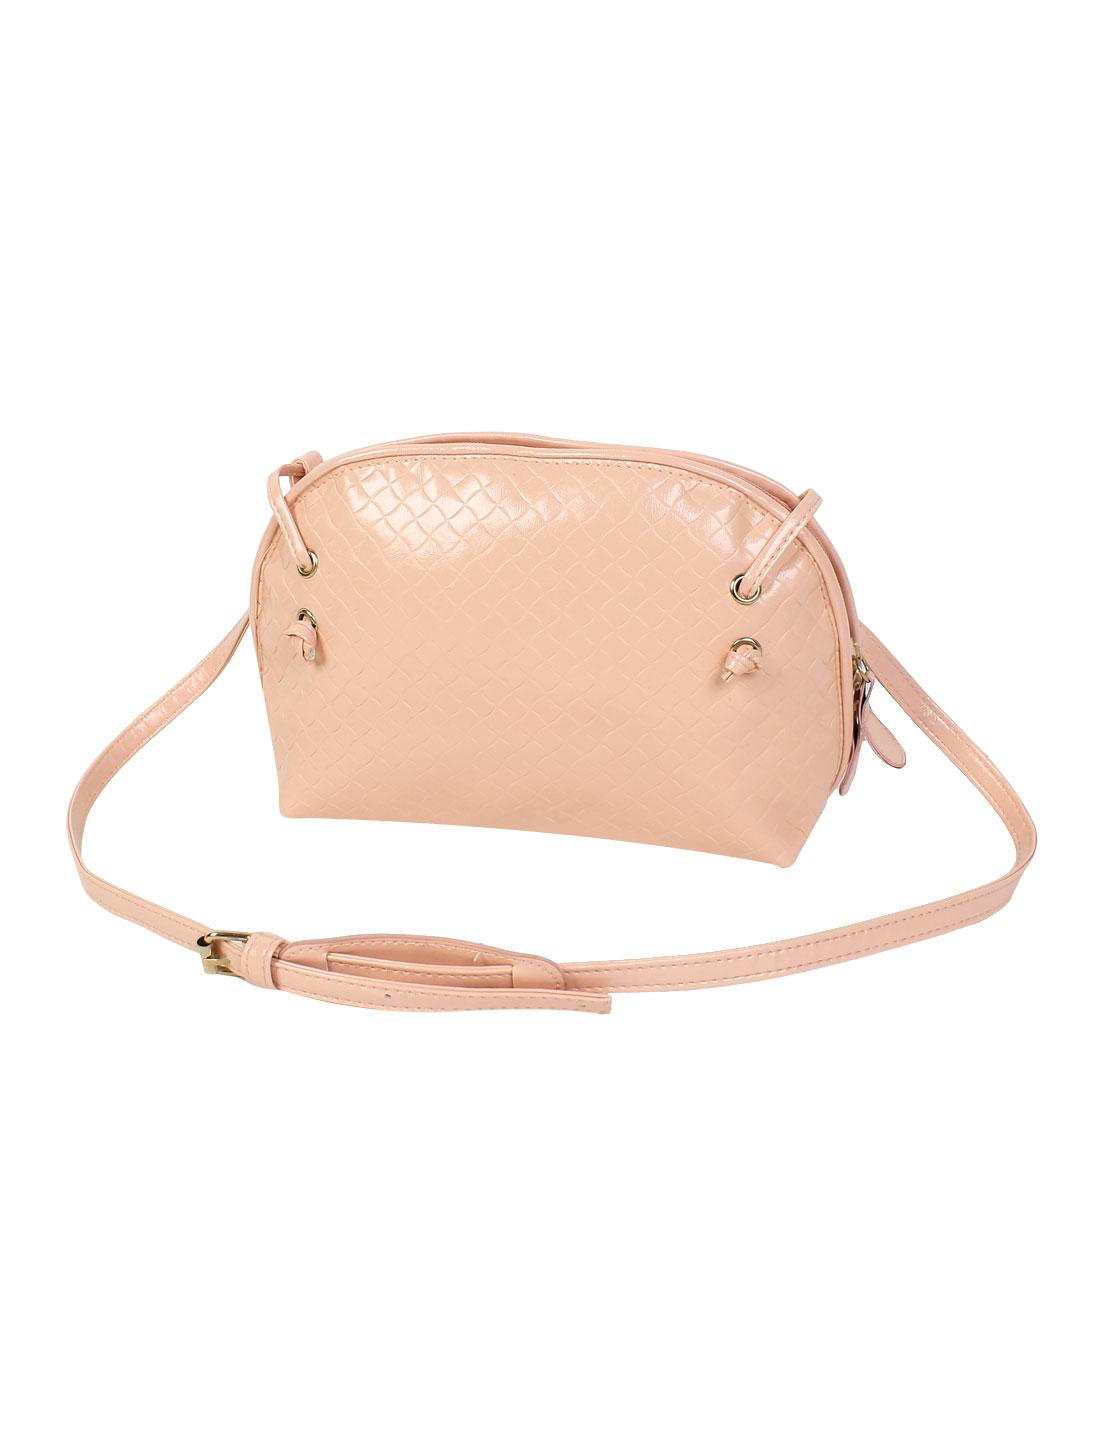 Women PU Tote Satchel Messenger Bag Casual Purse Cross Body Shoulder Handbag Pink